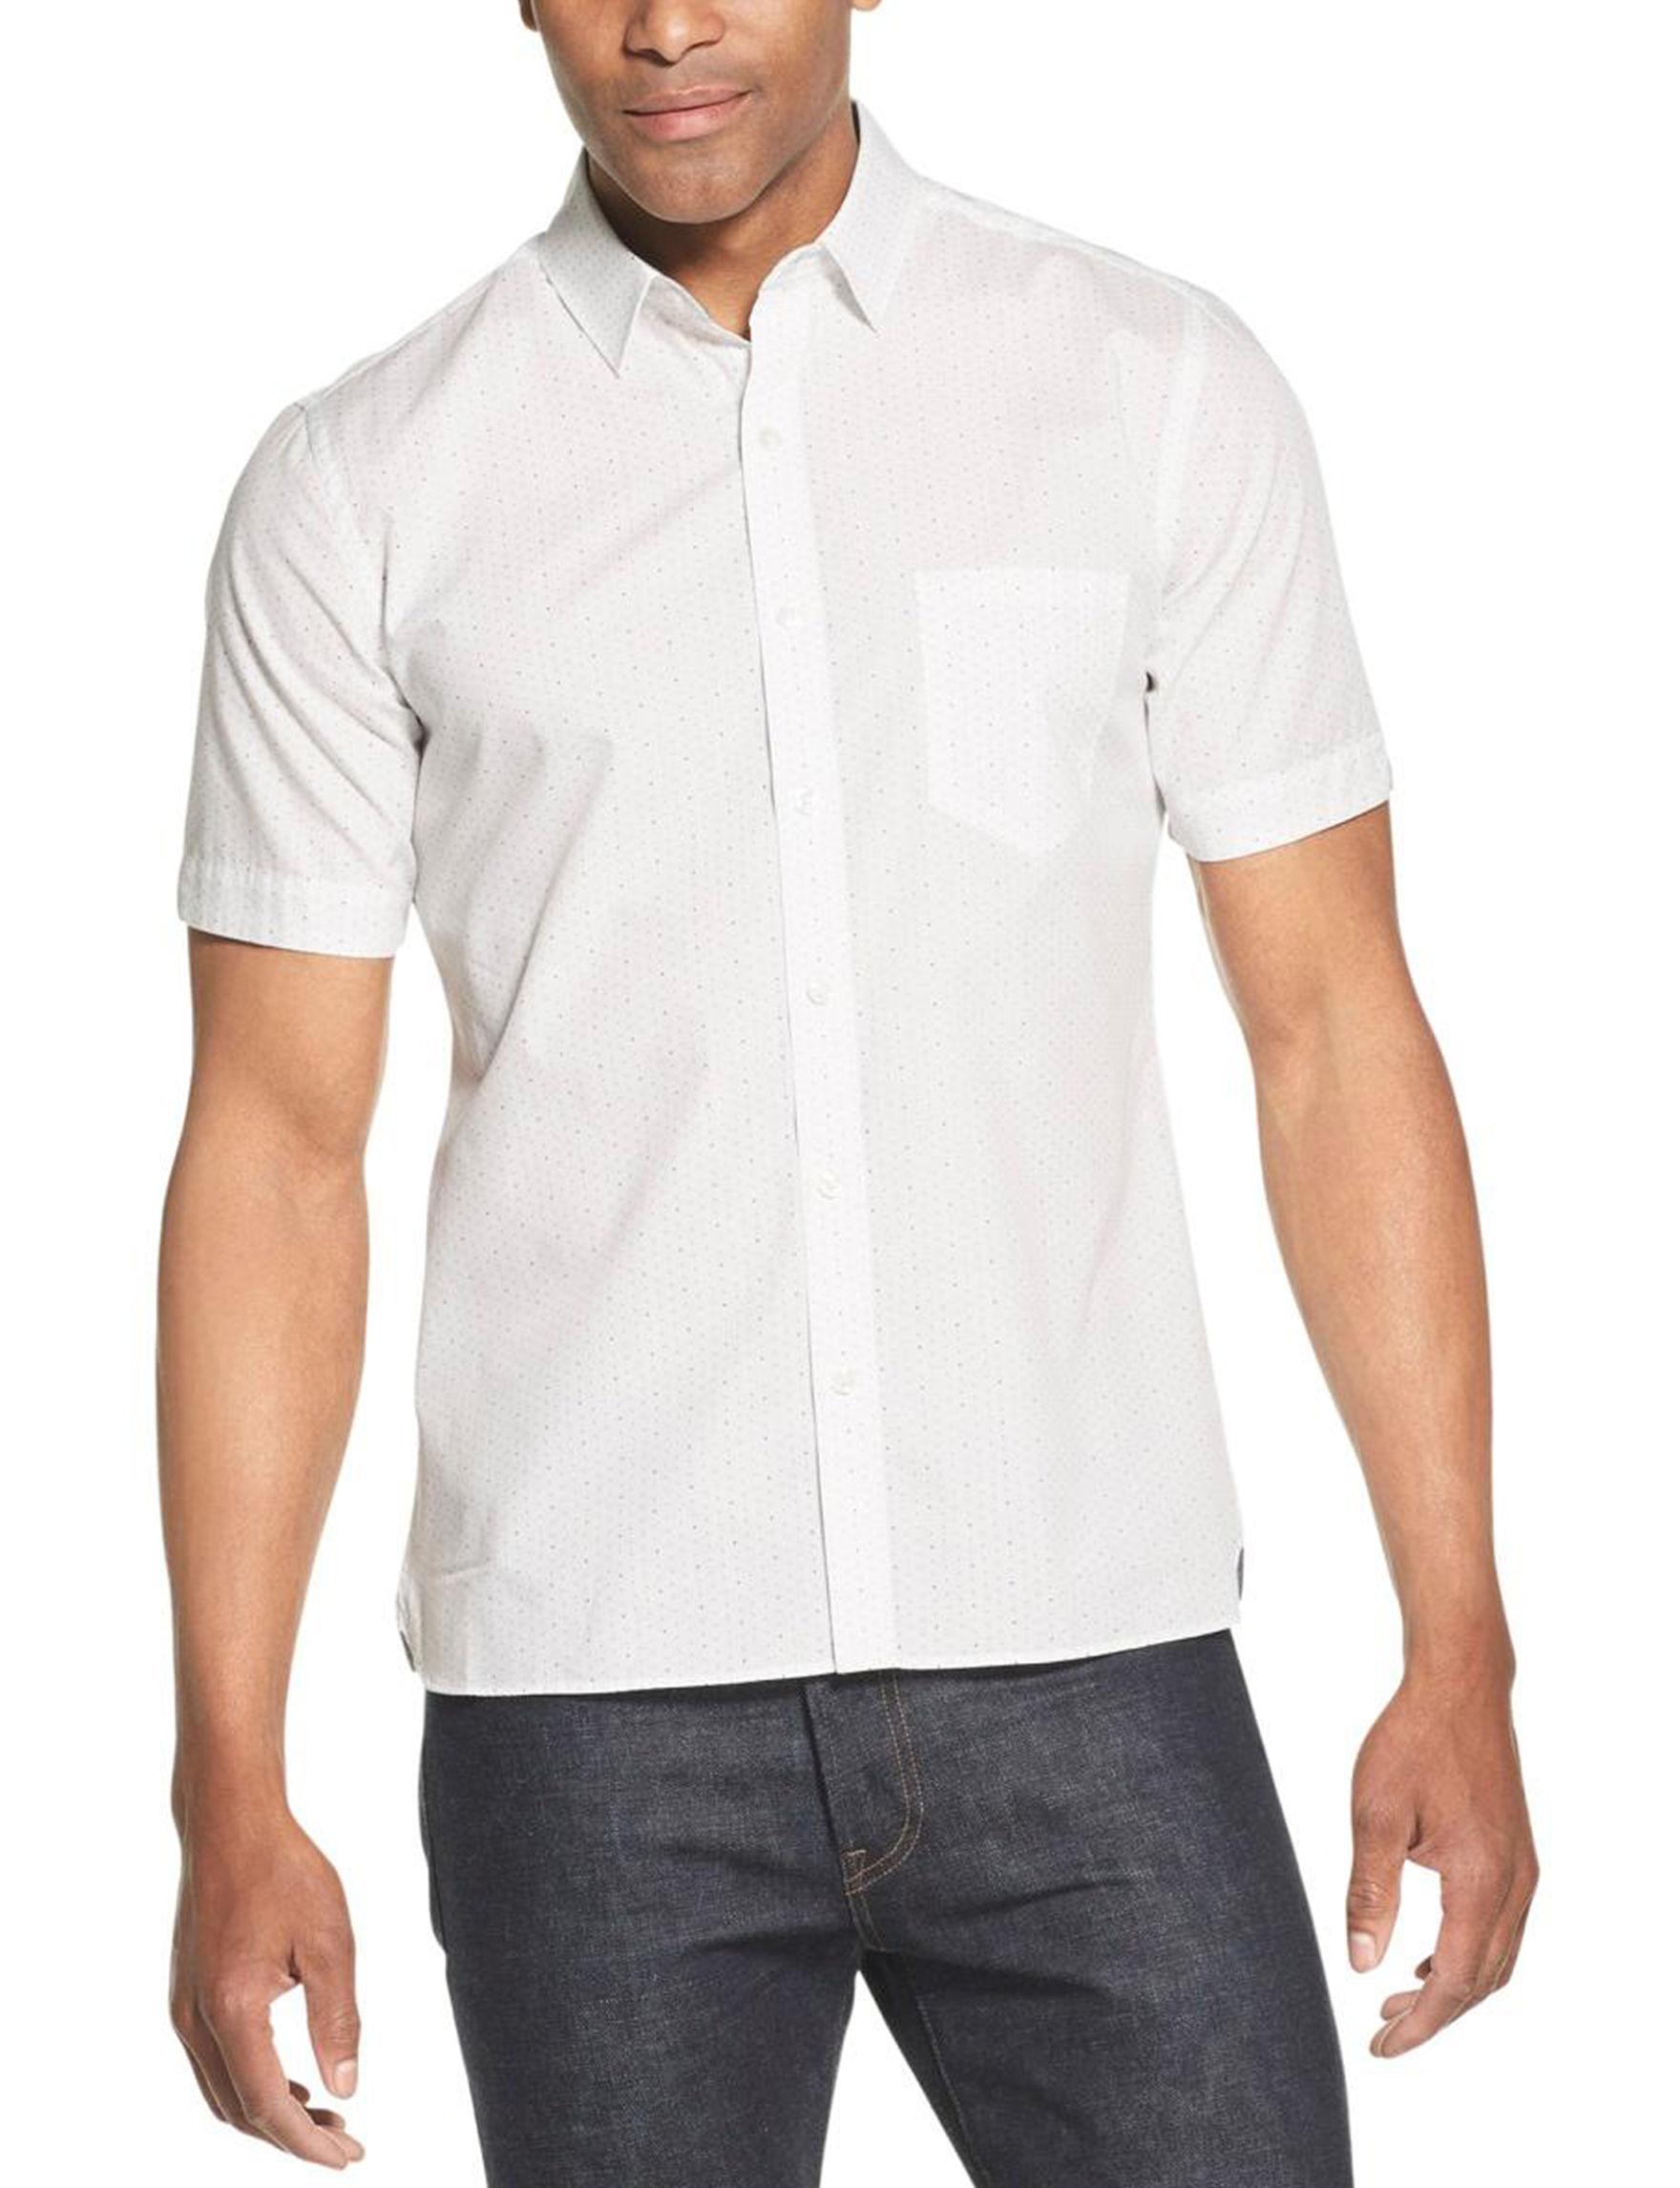 Van Heusen Bright White Casual Button Down Shirts